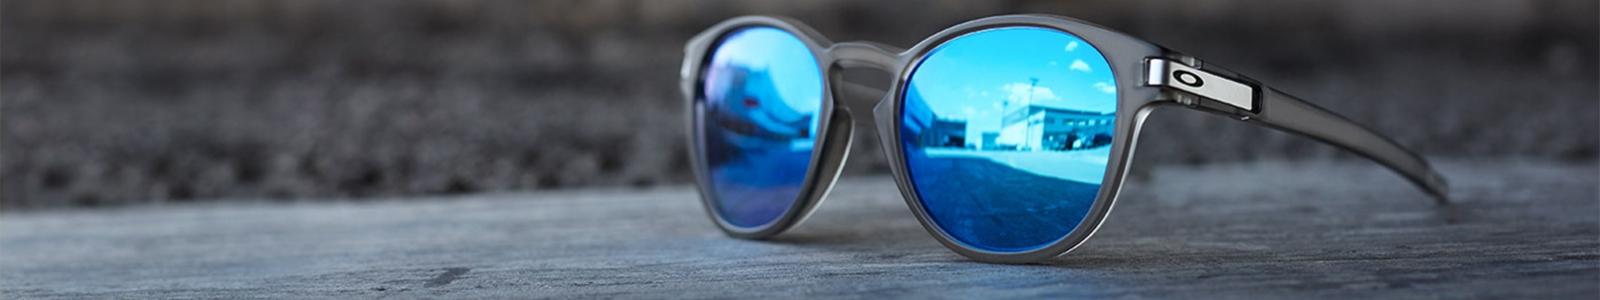 4f92c133b Prečo nosiť slnečné okuliare Oakley - Blog - BoardParadise.sk